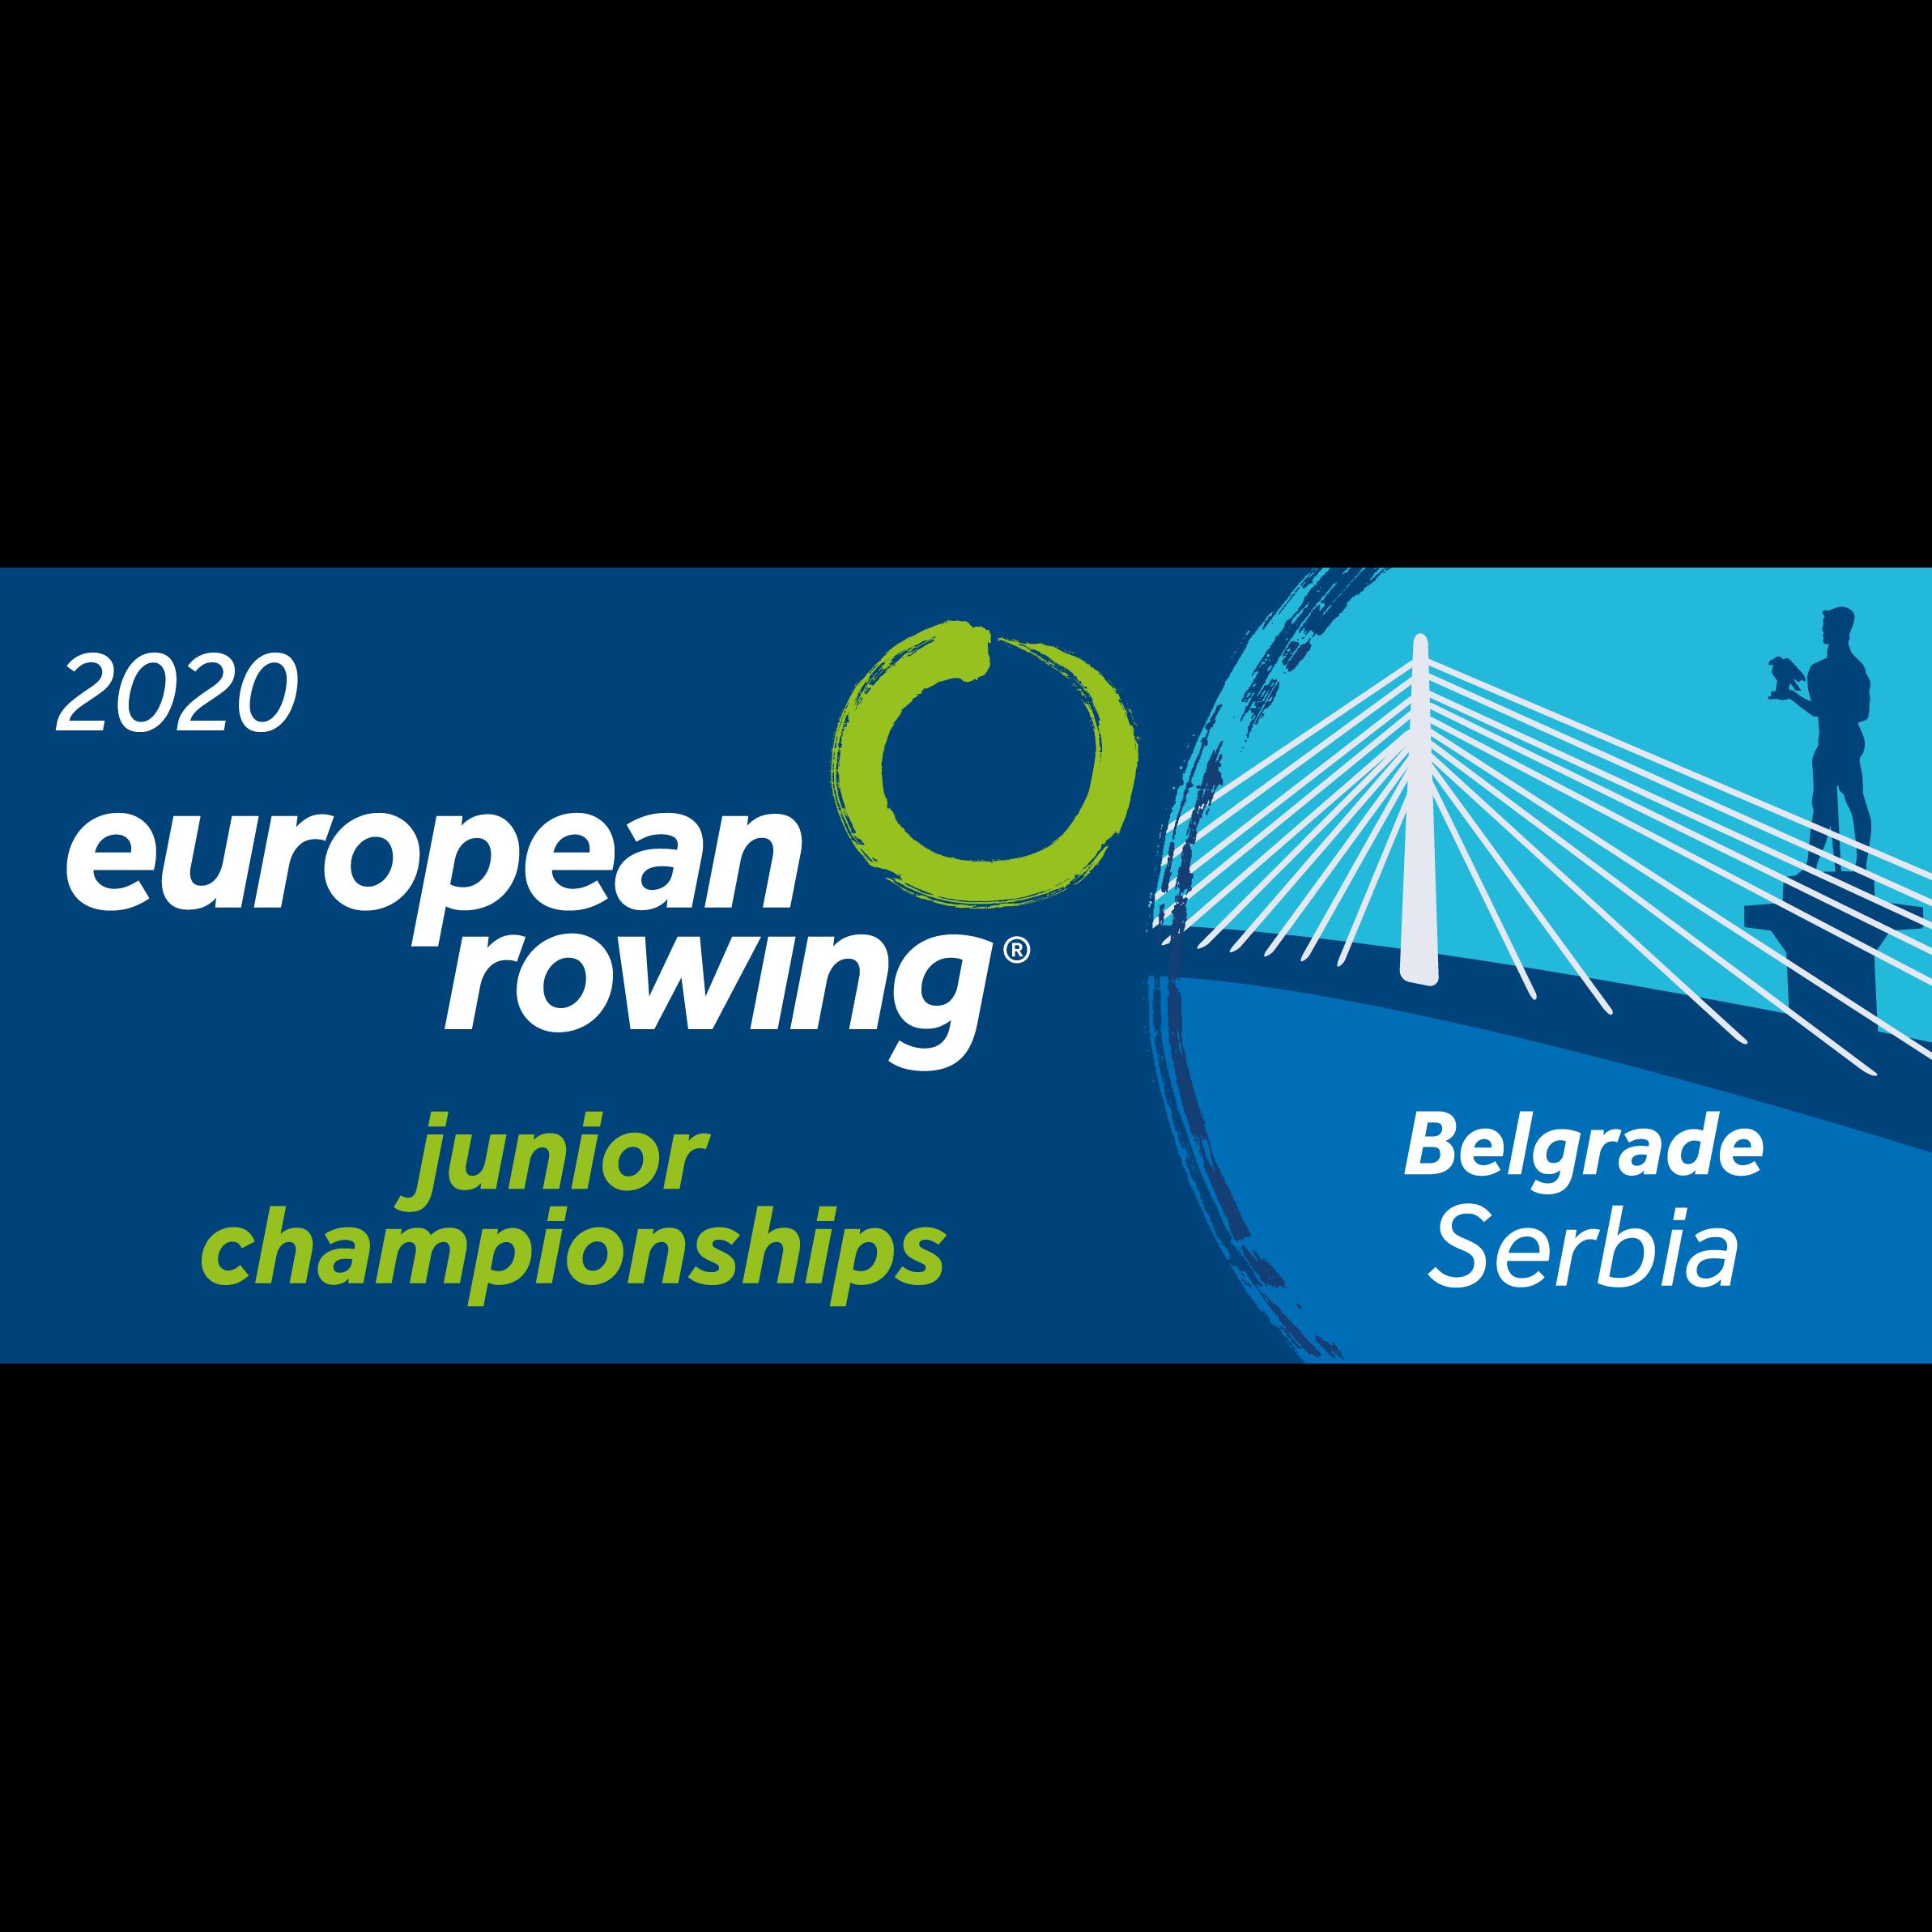 2020 European Rowing Junior Championships